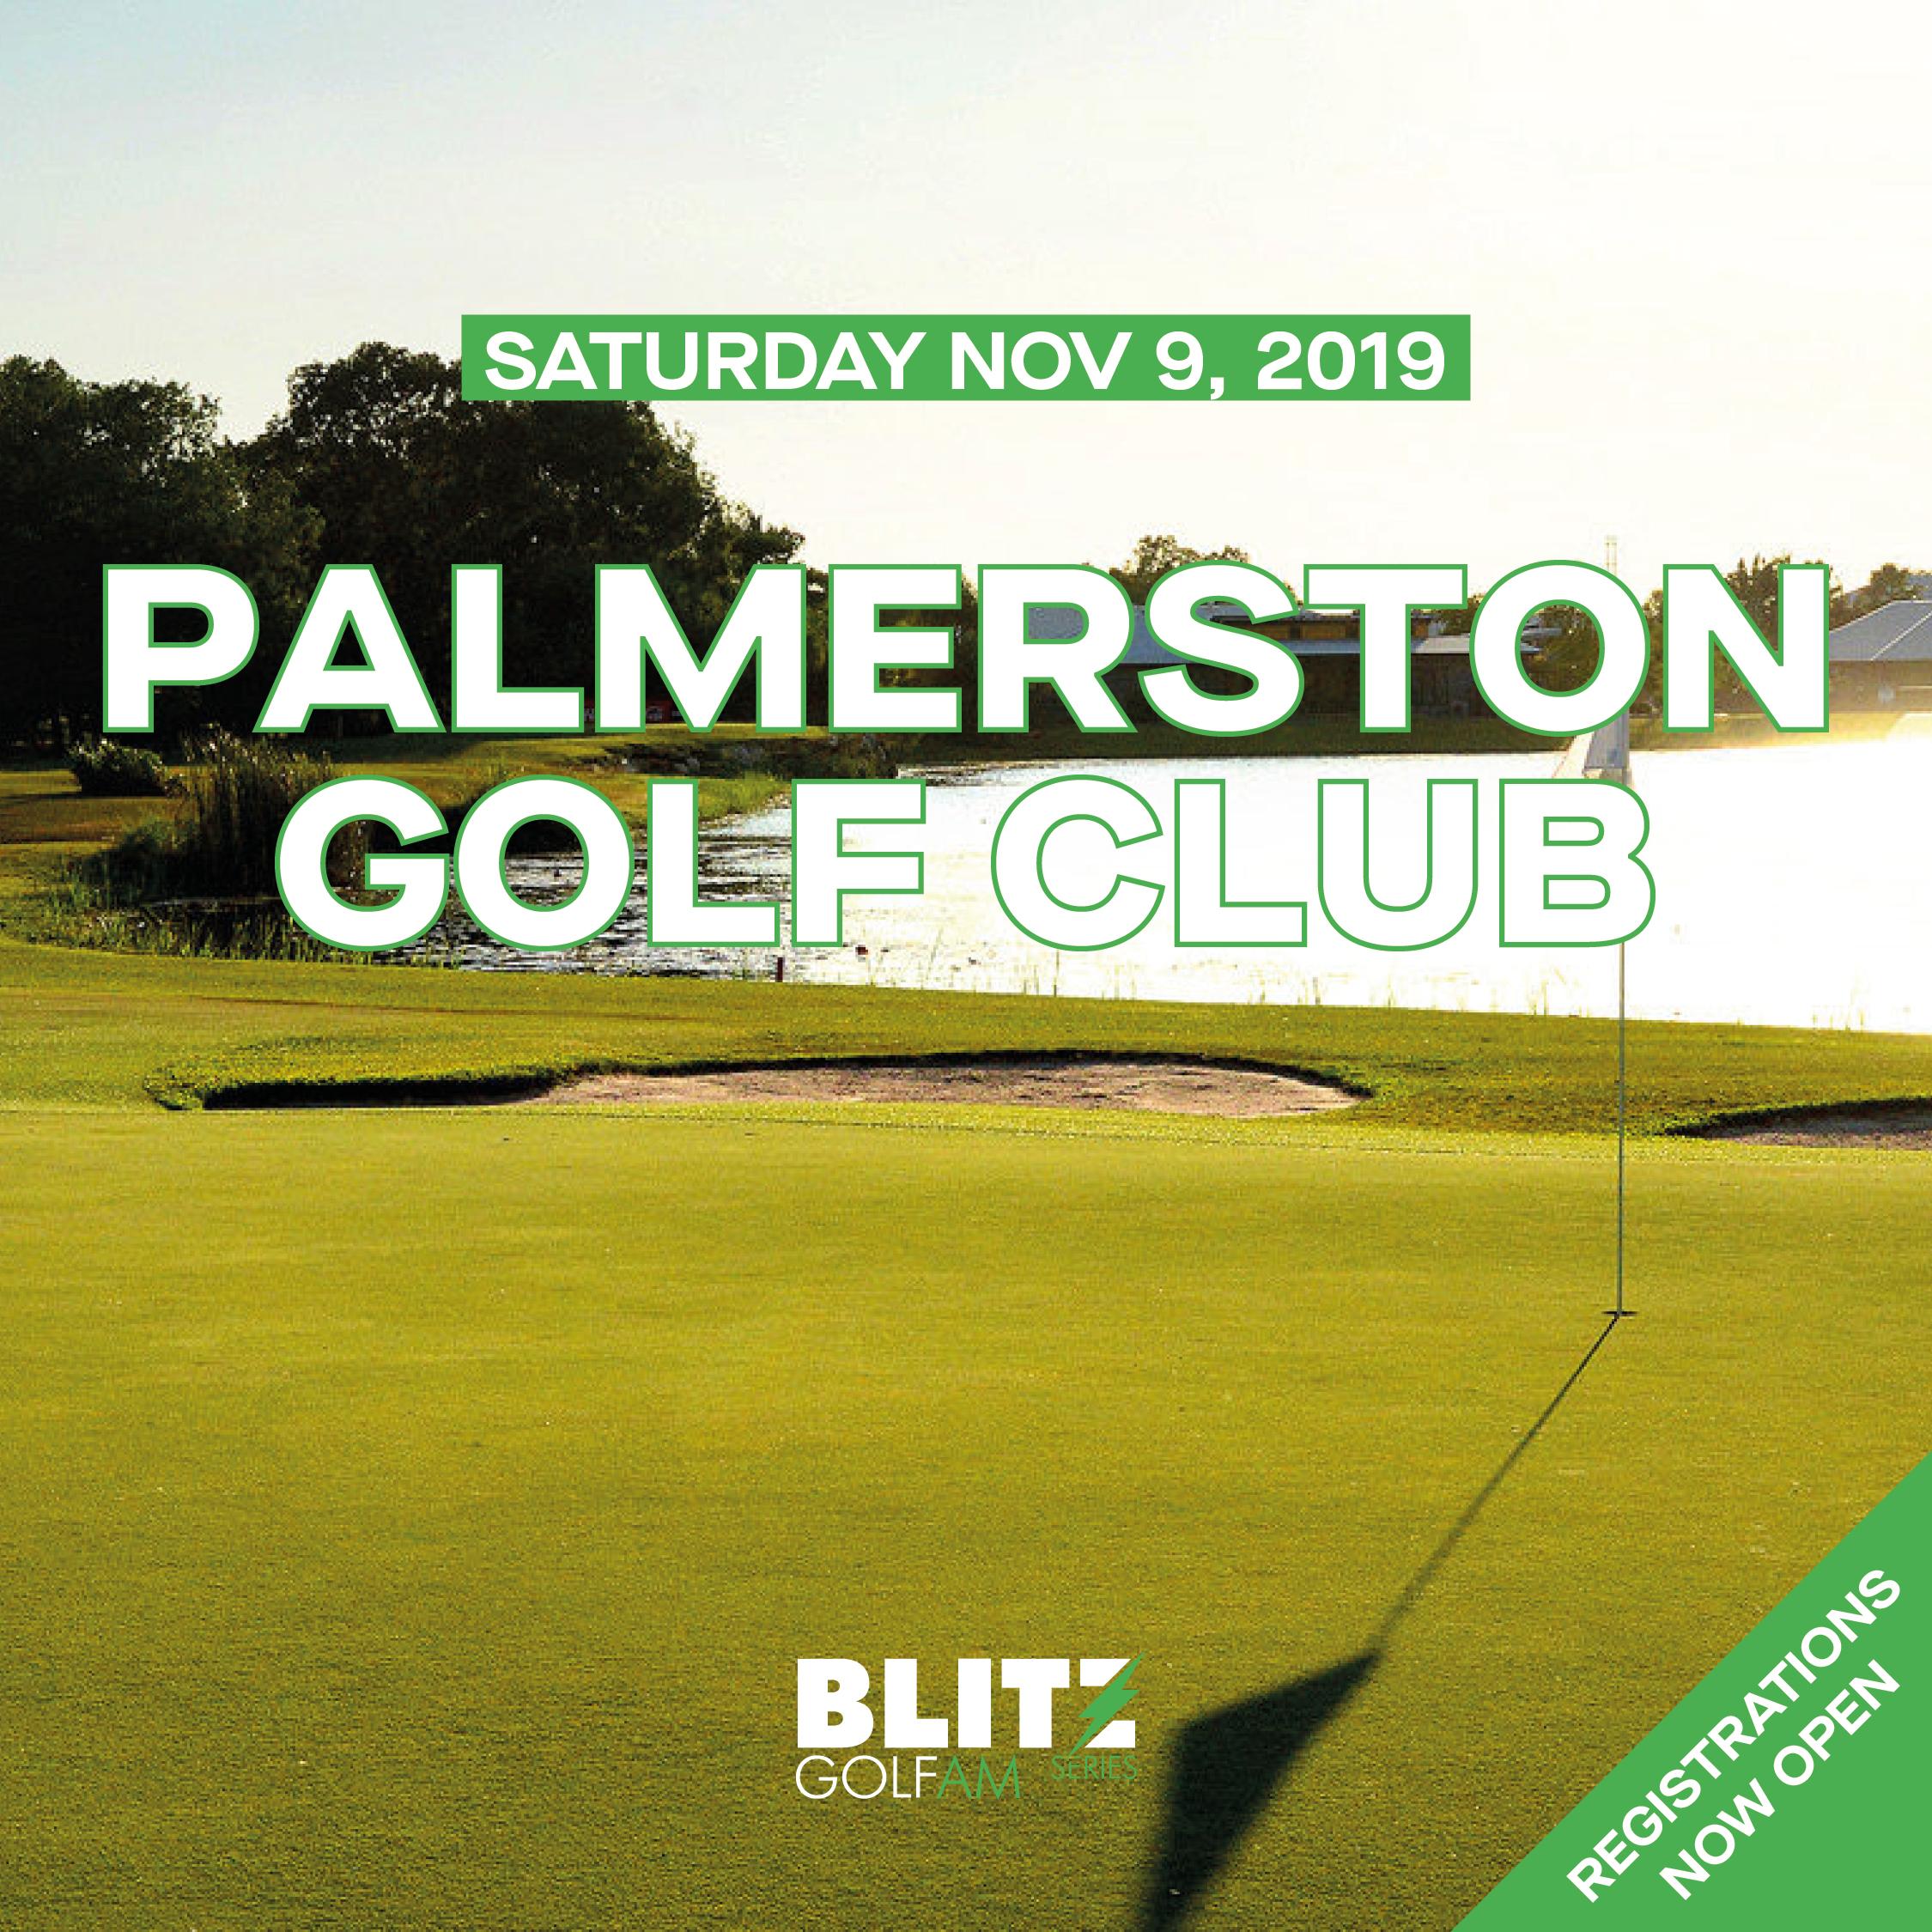 SANT_Palmerston_Blitz 2020_AM Series Launch_091119.jpg